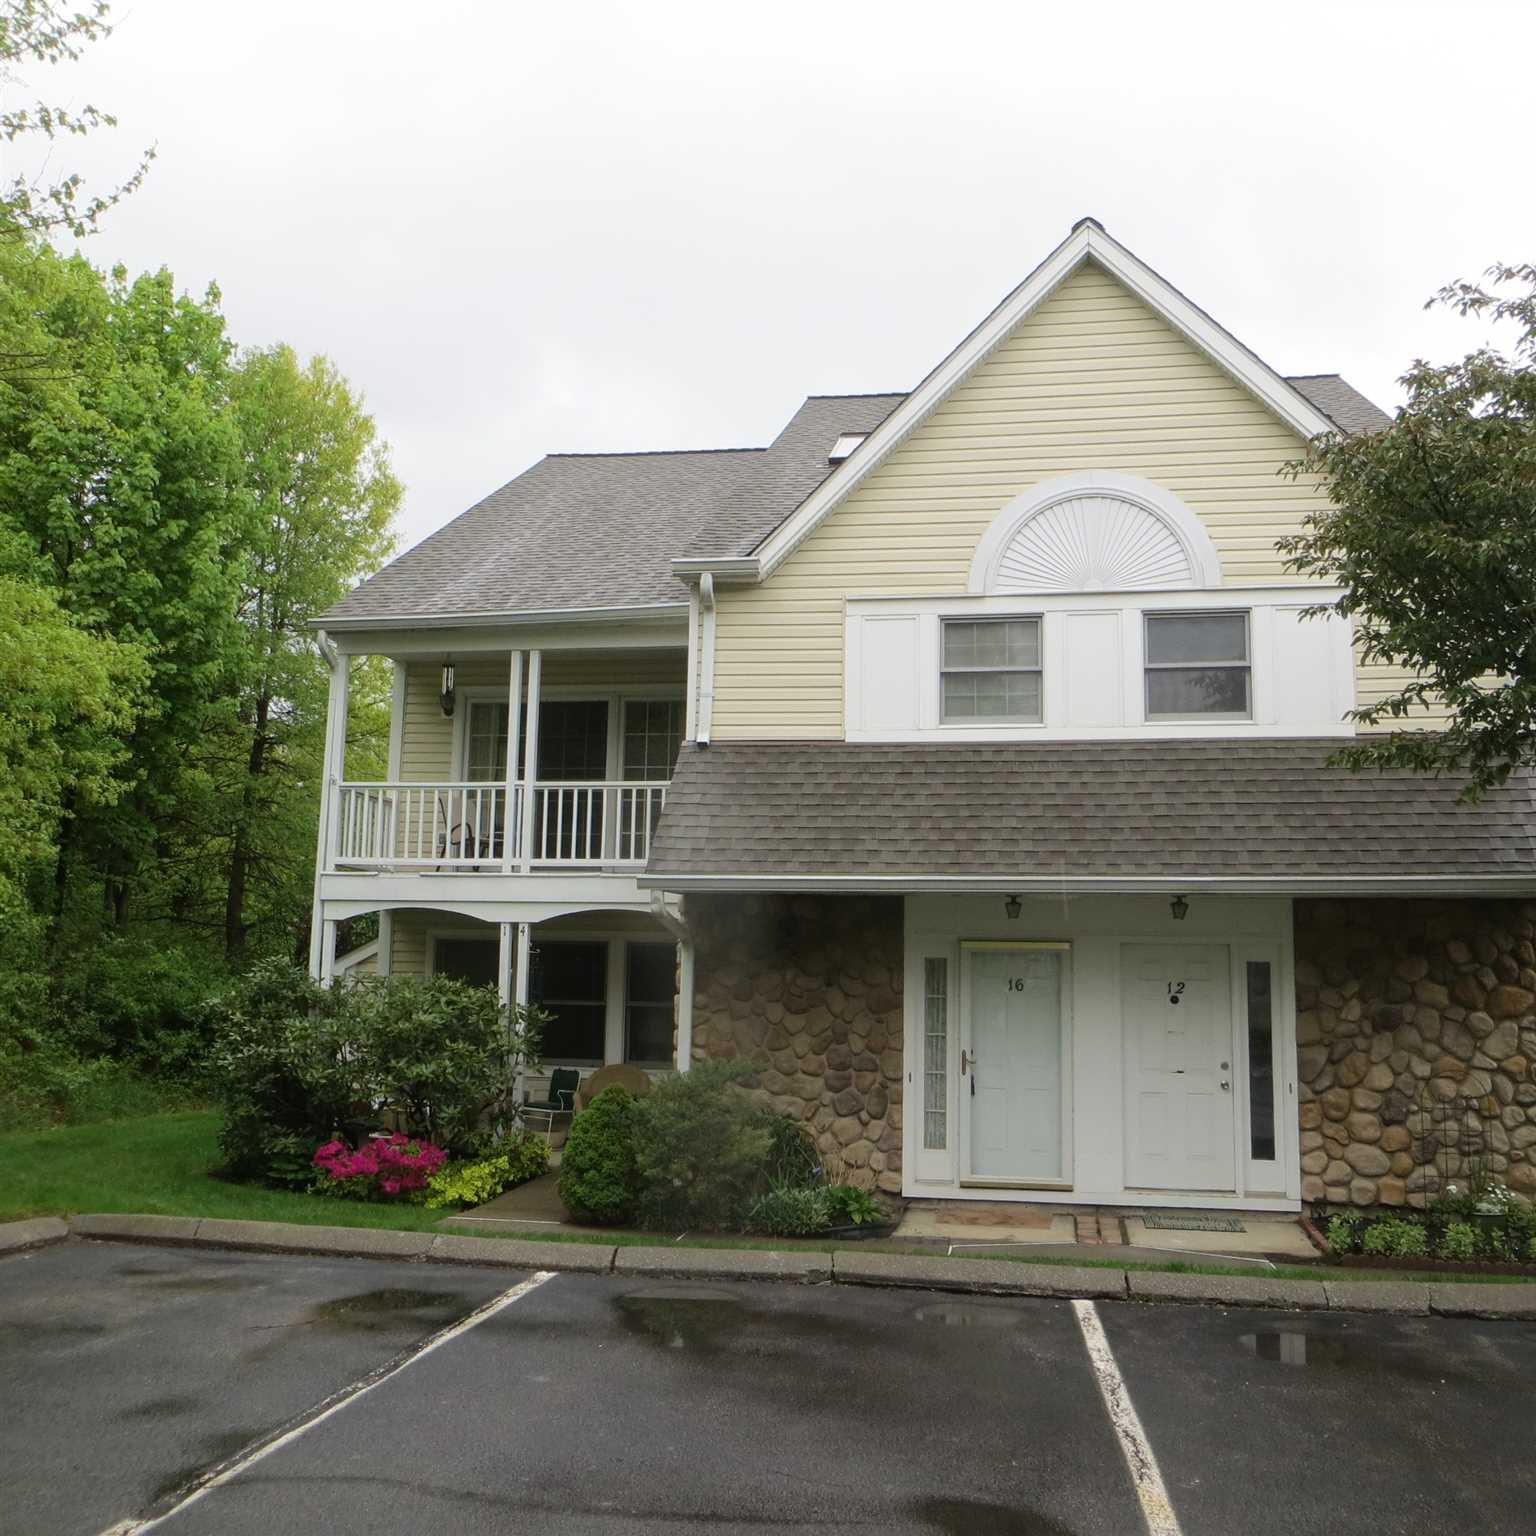 Single Family Home for Sale at 16 BURNHAM Court 16 BURNHAM Court Fishkill, New York 12524 United States